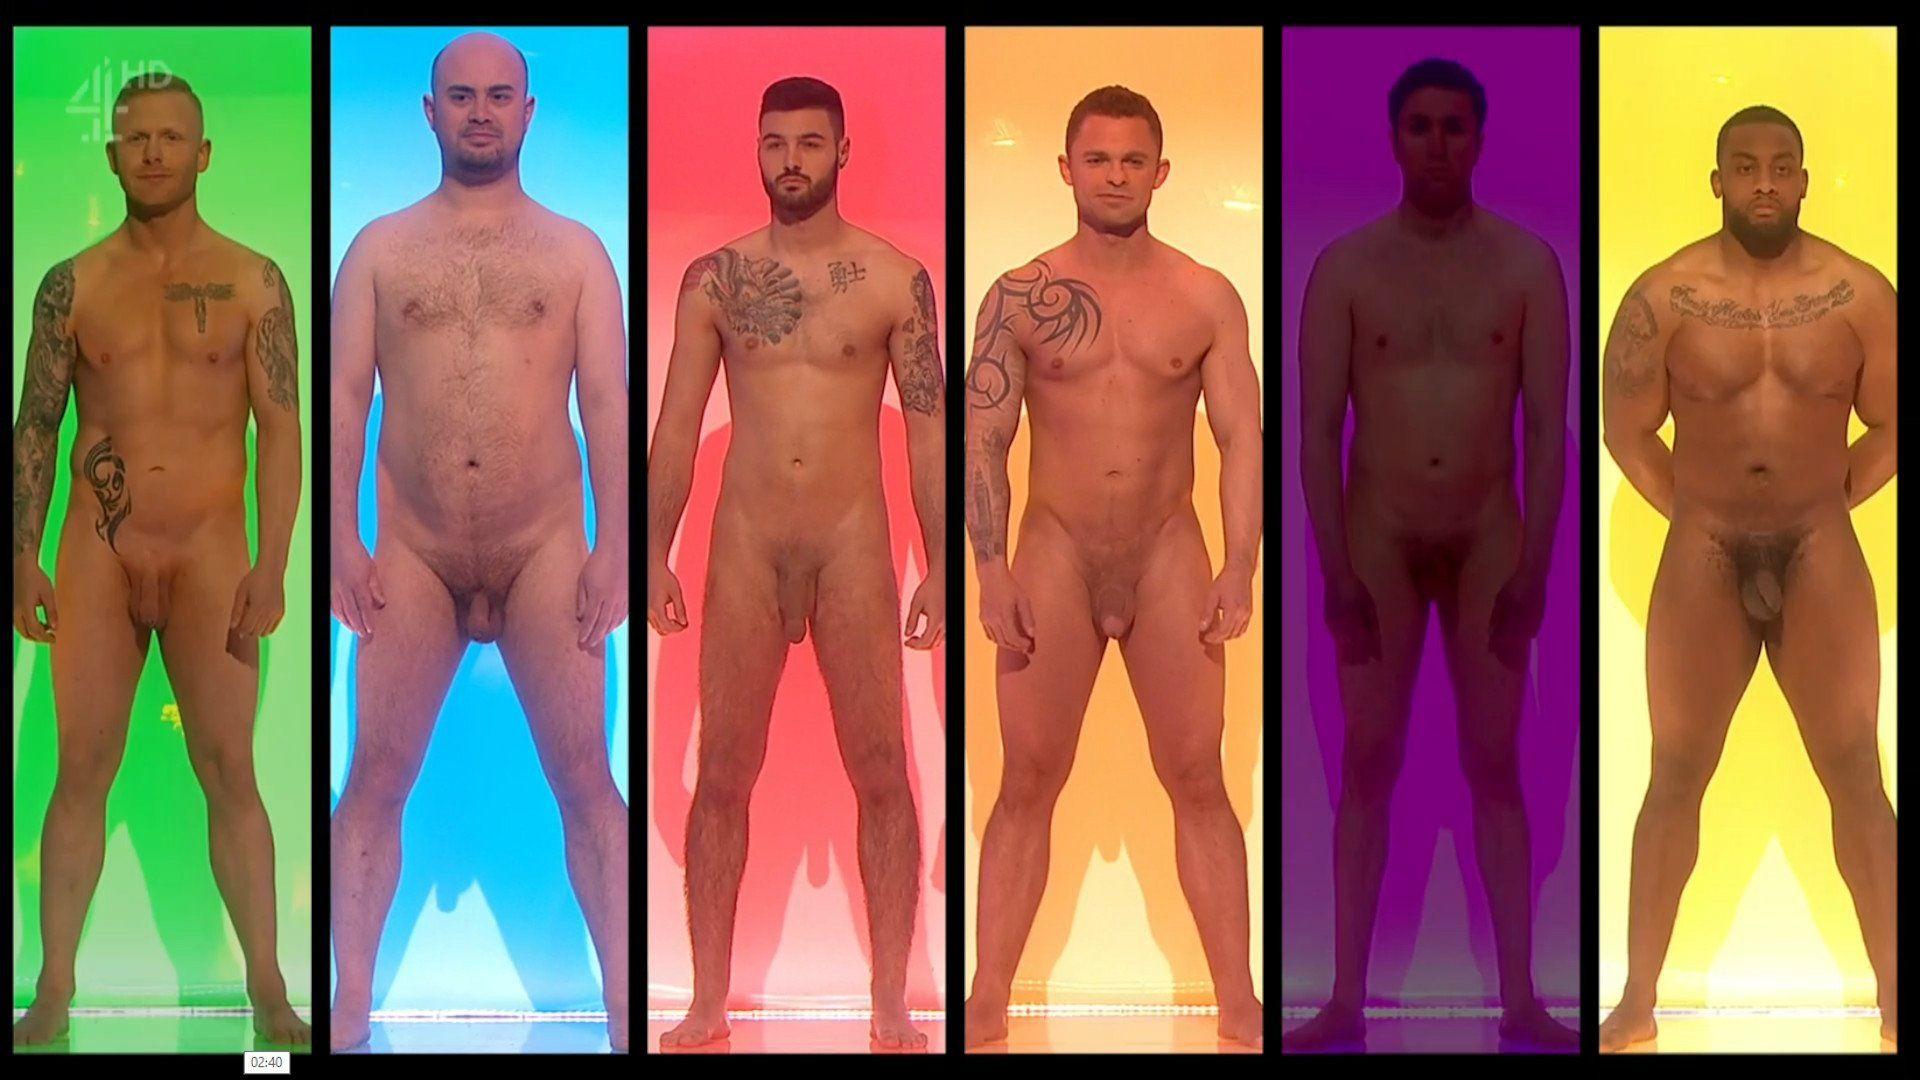 Dick naked big Huge